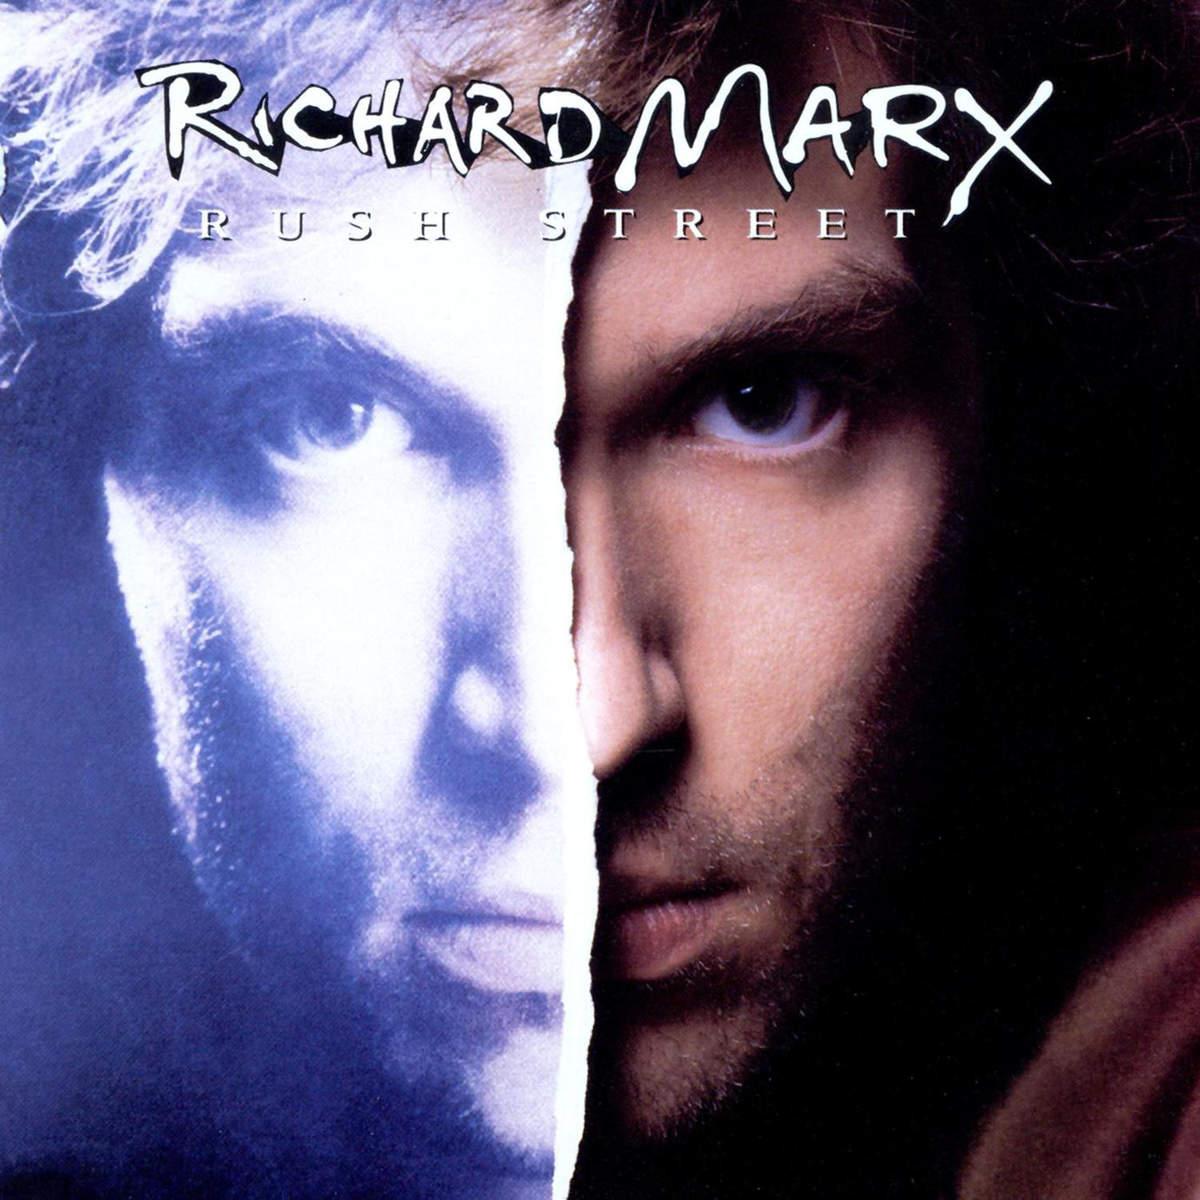 [90's] Richard Marx - Take This Heart (1991) Richard%20Marx%20-%20Rush%20Street-